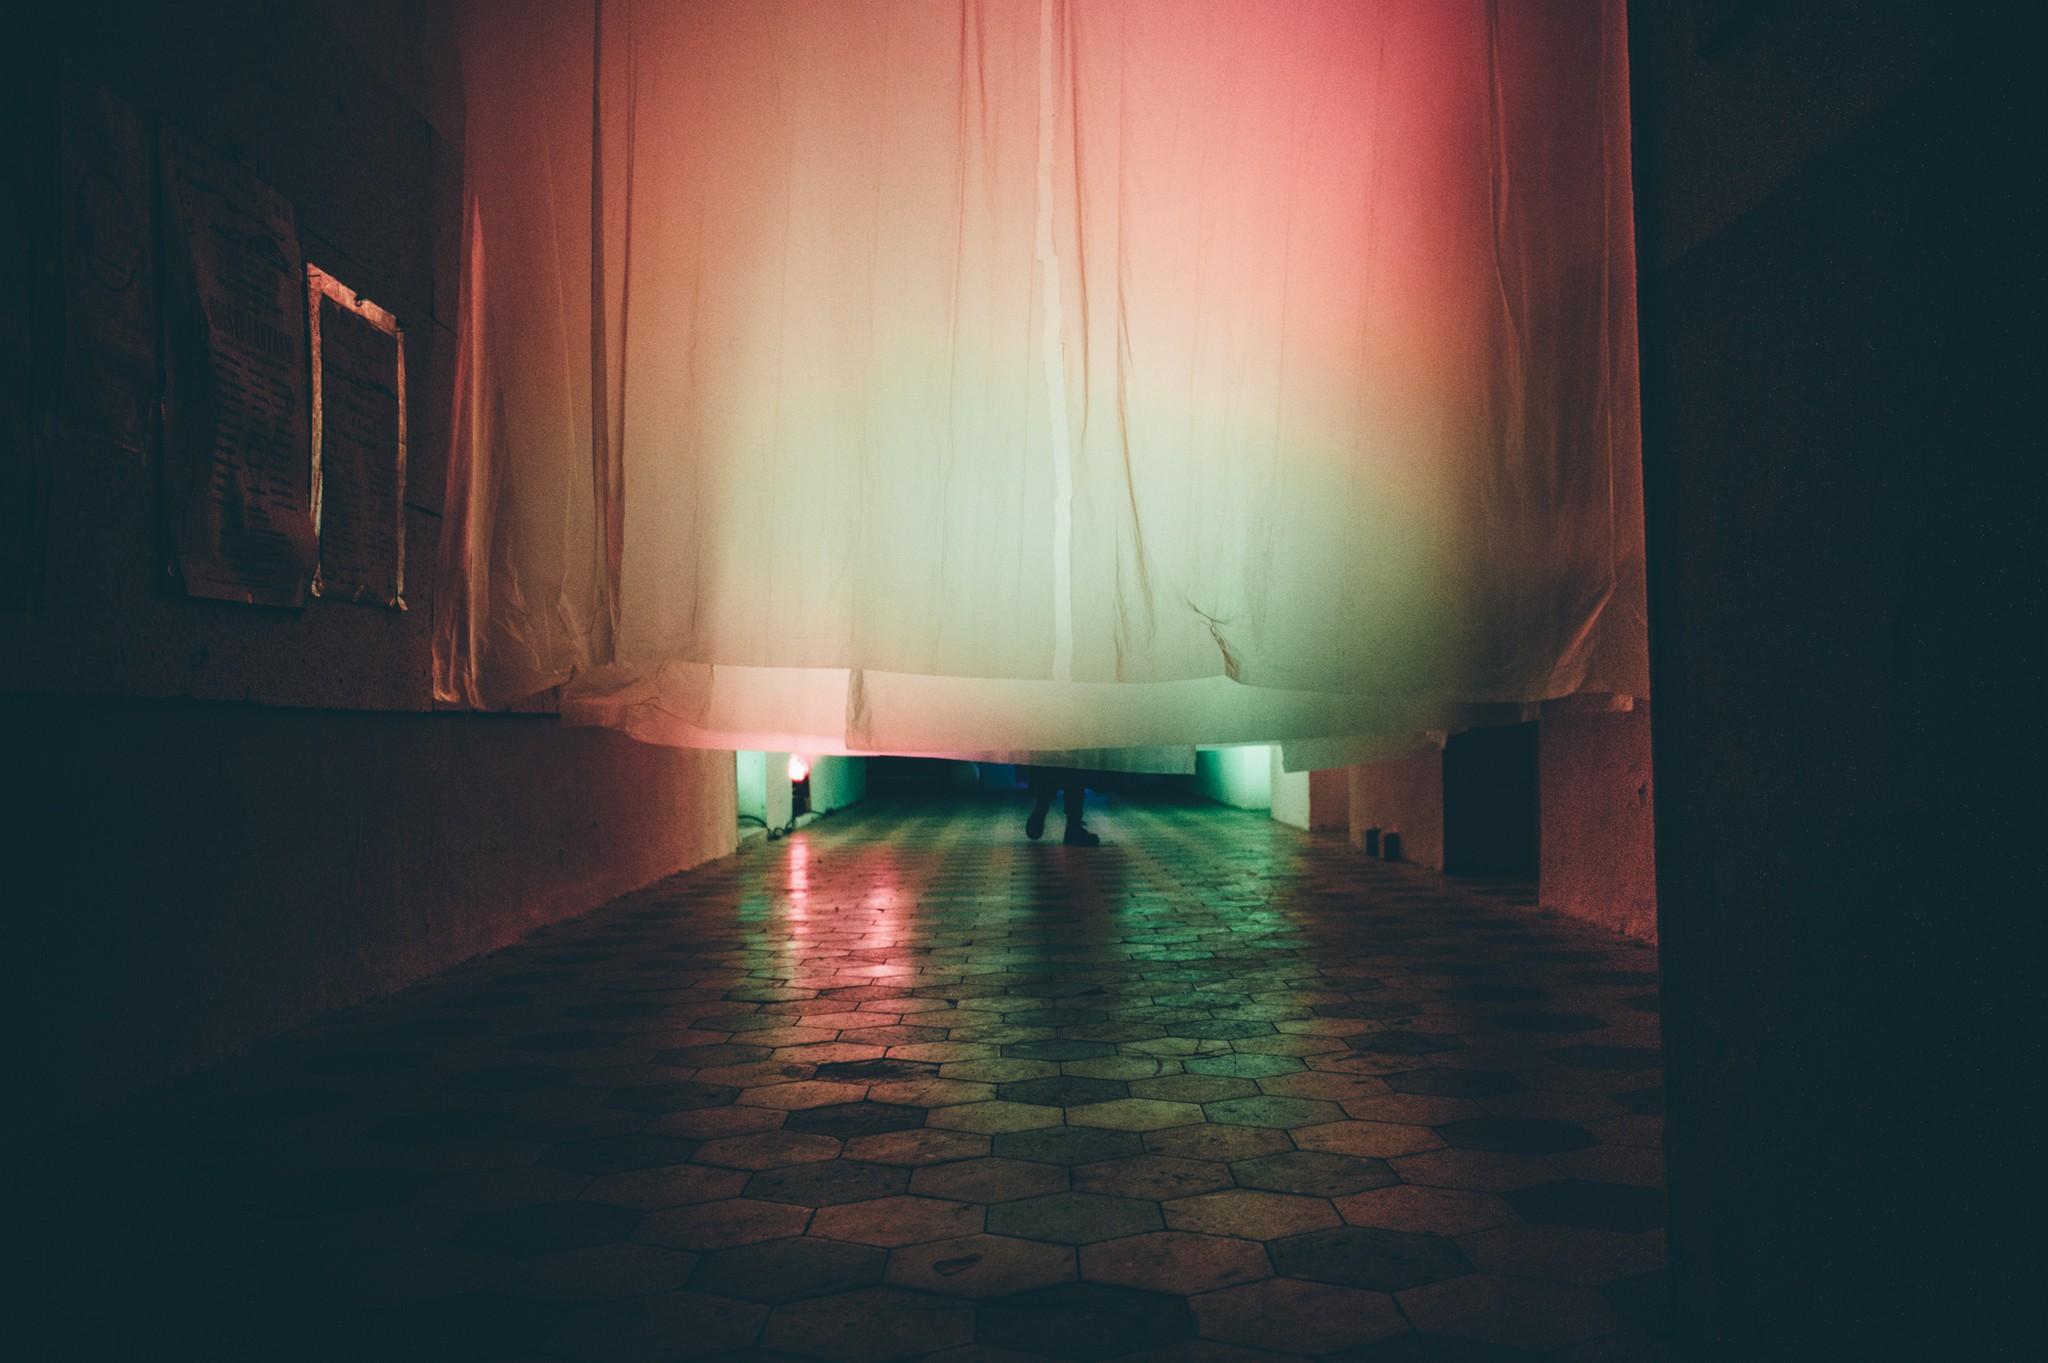 Flavia_Fiengo_esperimenti_2017_40